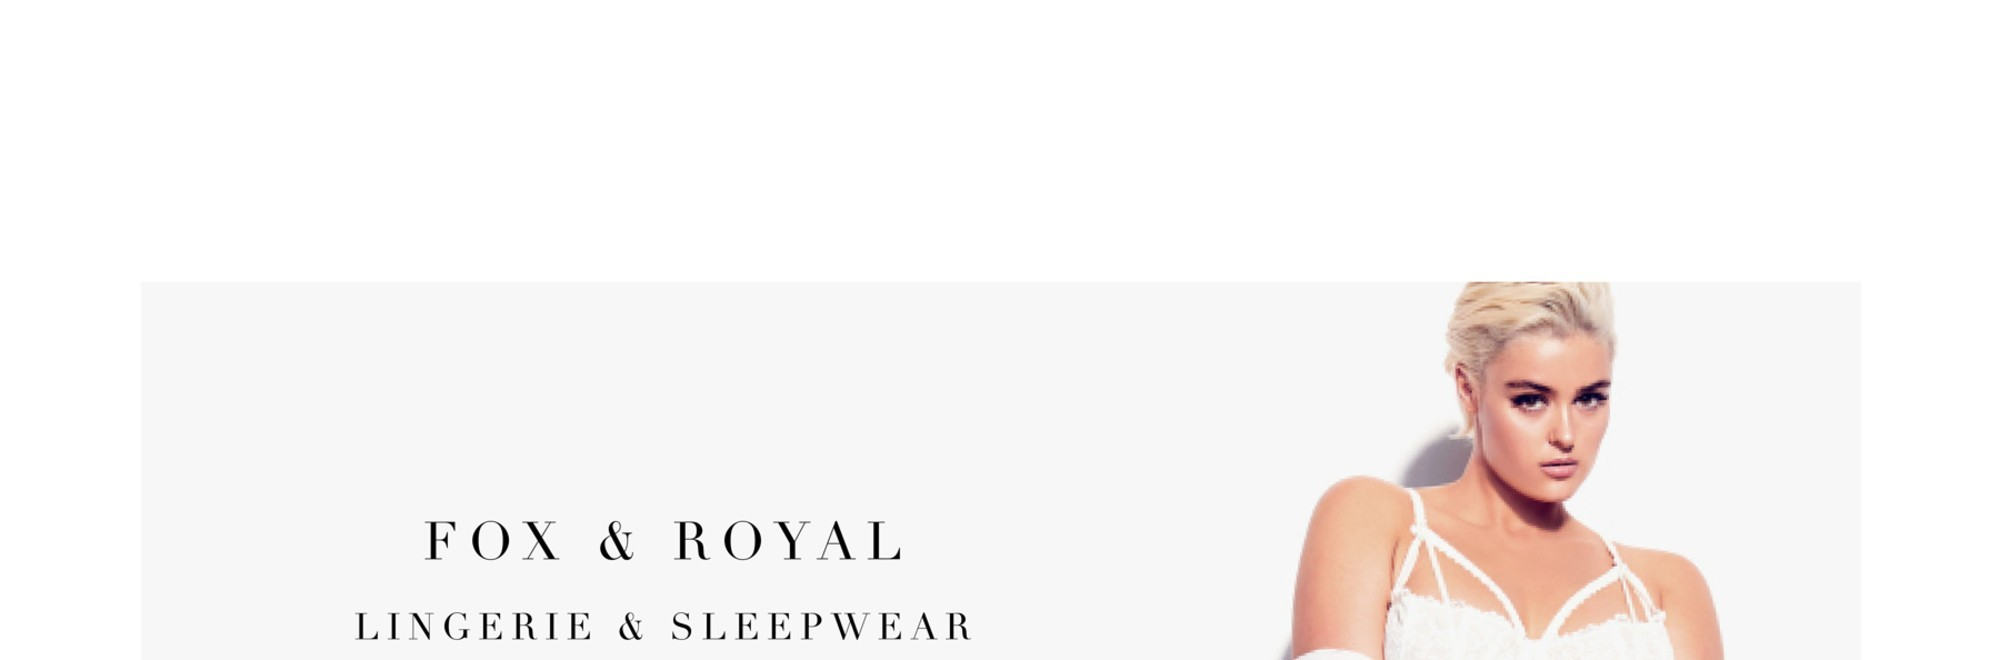 New Fox & Royal